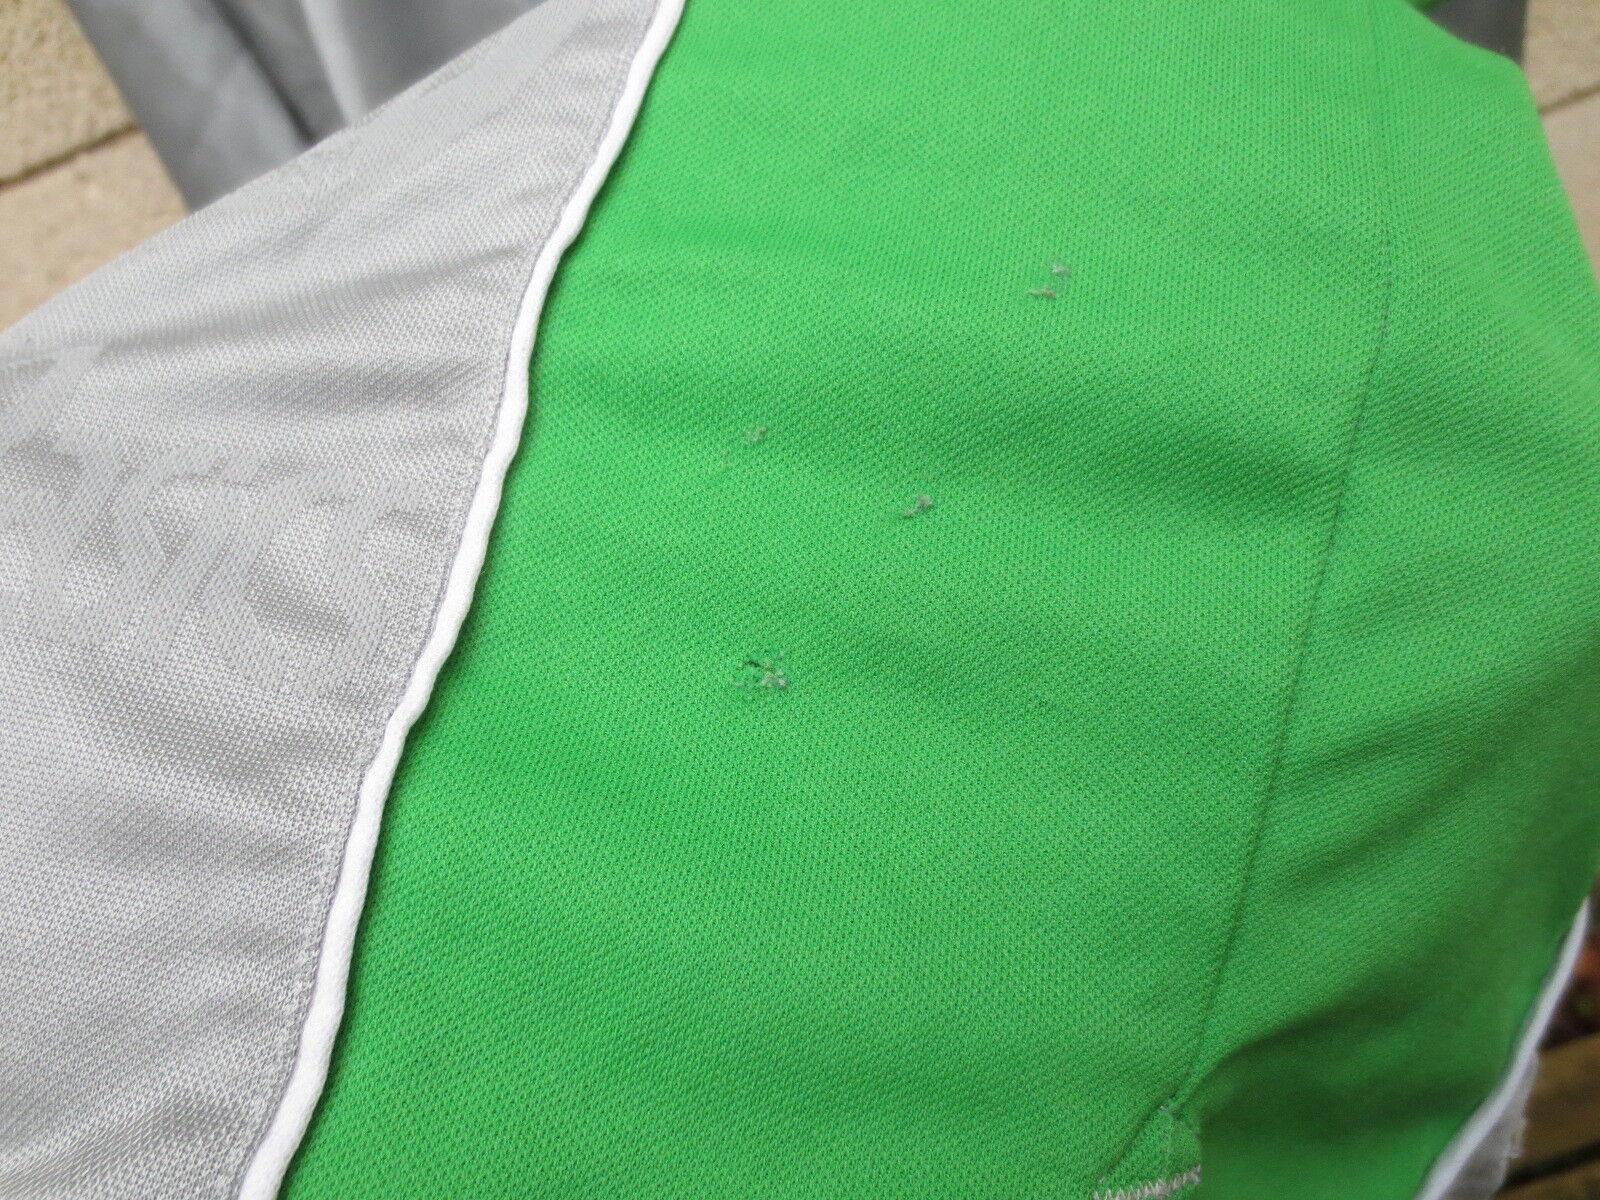 VINTAGE Maillot SAINT-ETIENNE 2000 ASICS shirt football shirt ASICS SABLE n°27 gris away XL 9927be